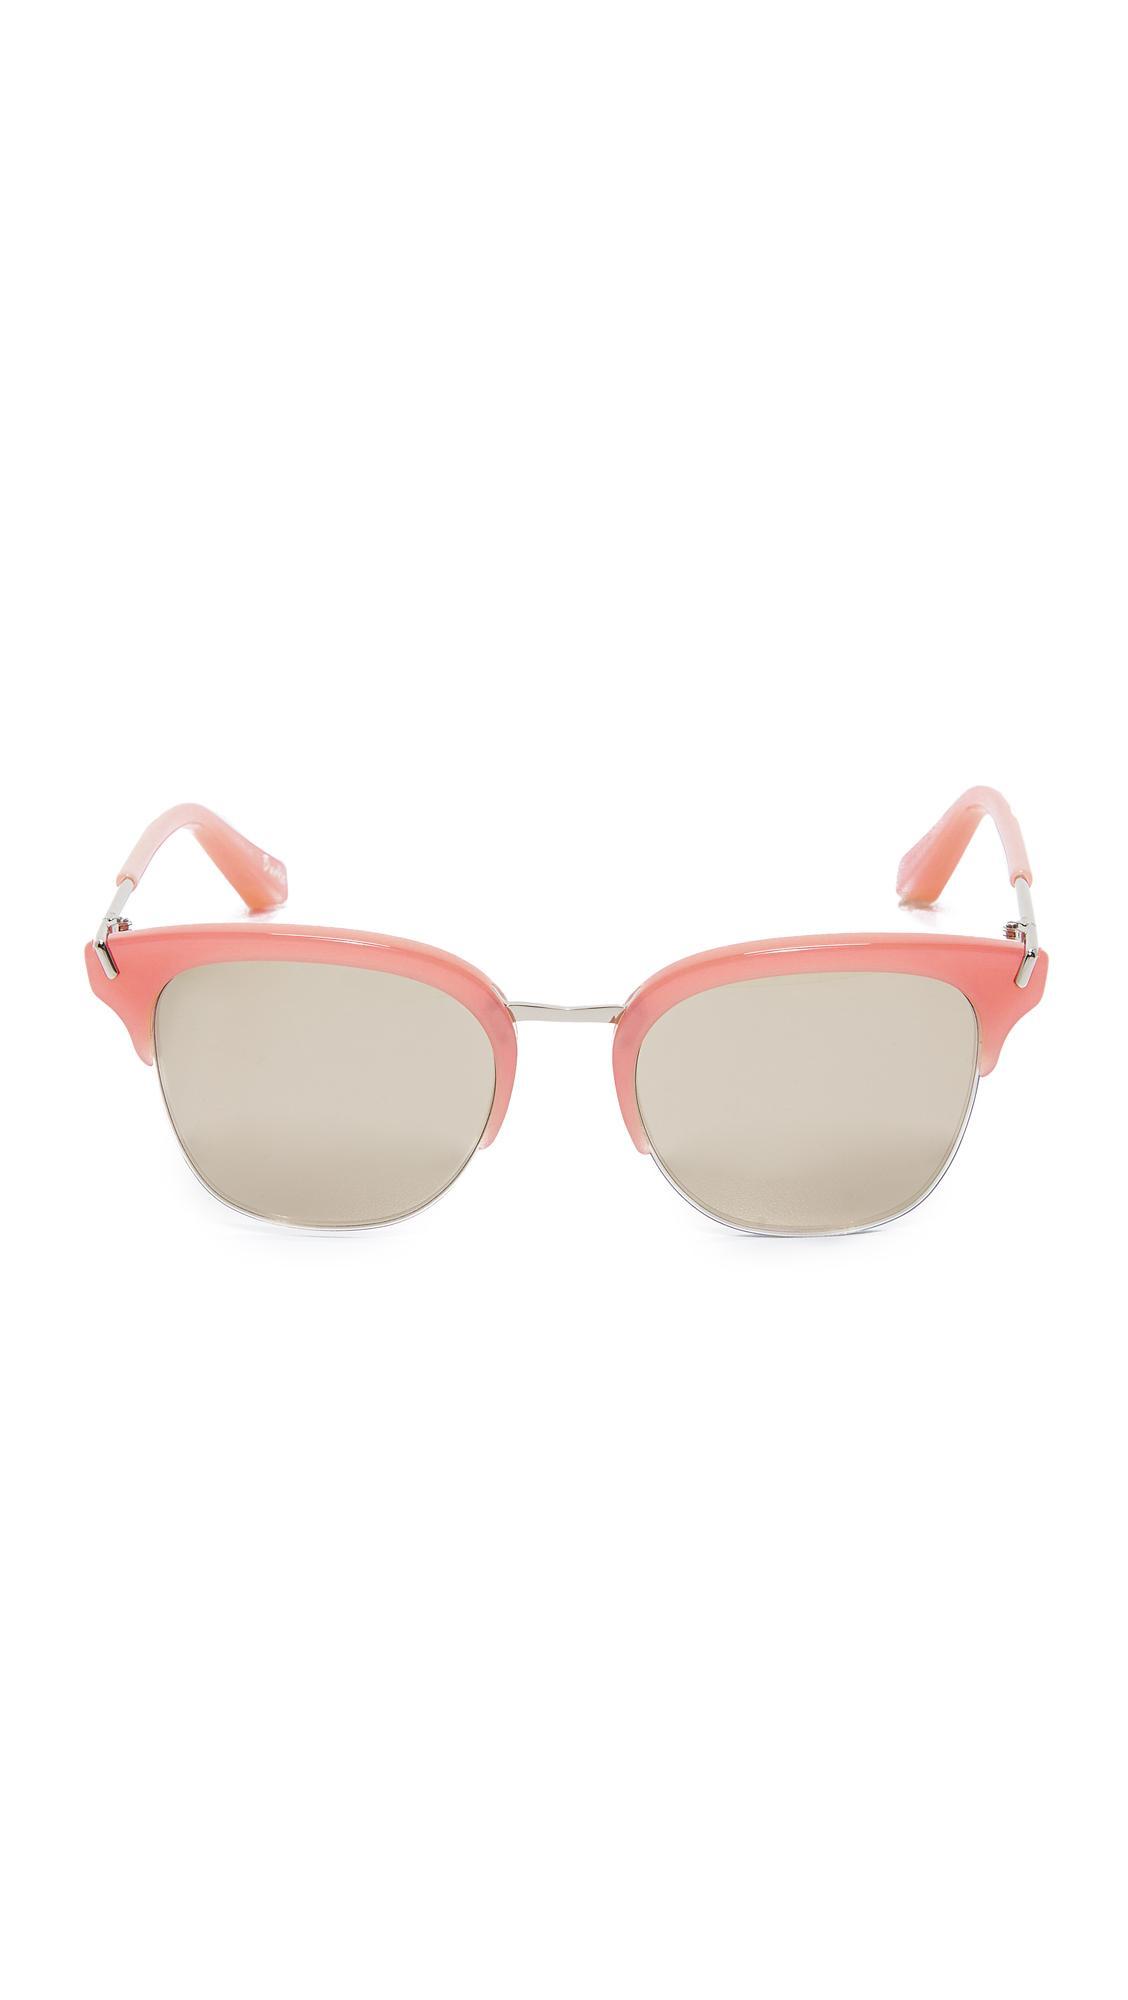 Jim Burke Ford >> Elizabeth And James Burke Flash Sunglasses - Lyst